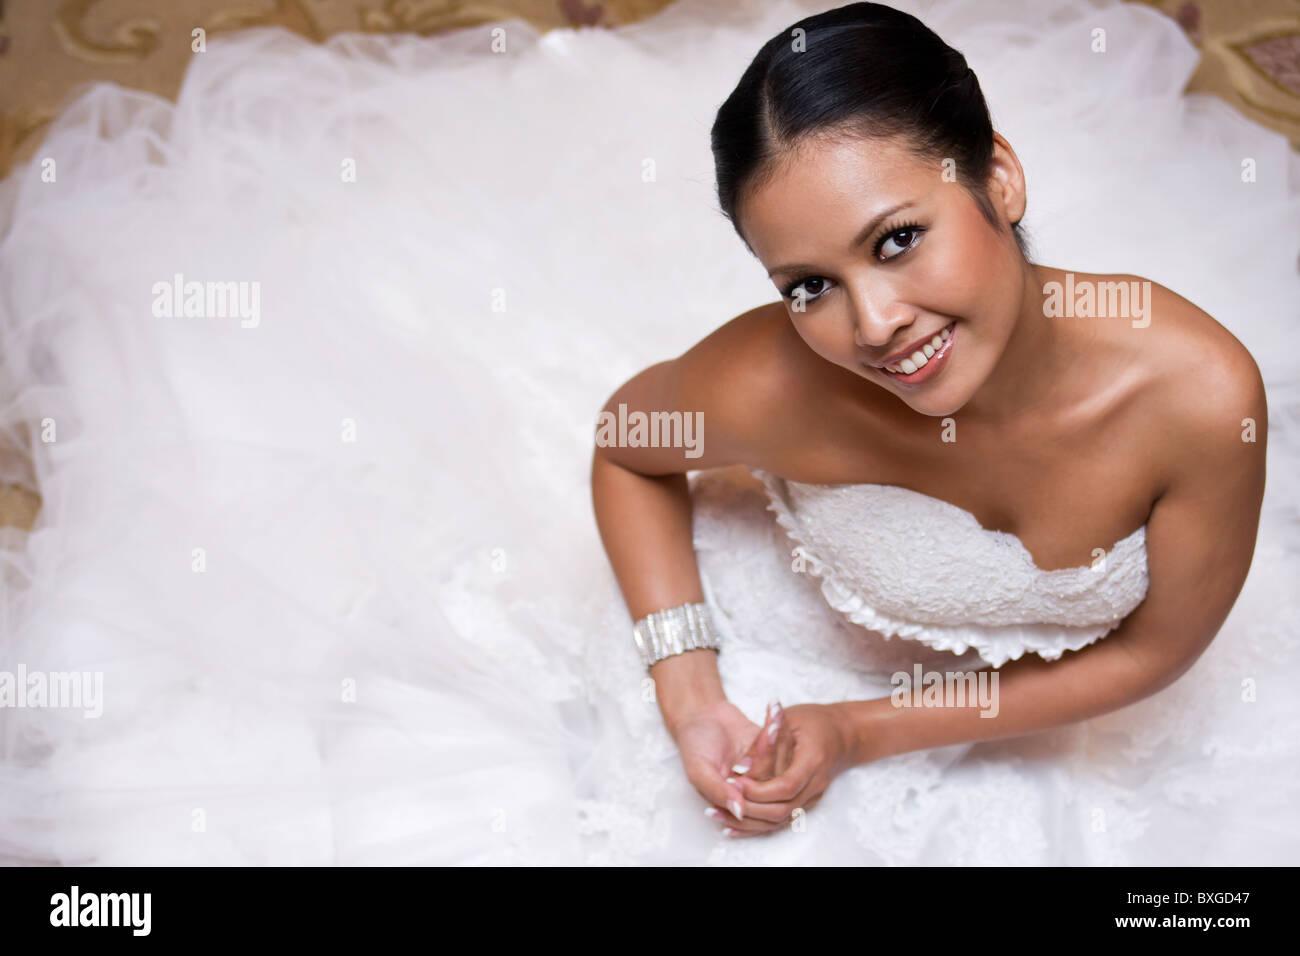 https://c8.alamy.com/comp/BXGD47/beautiful-thai-bride-BXGD47.jpg